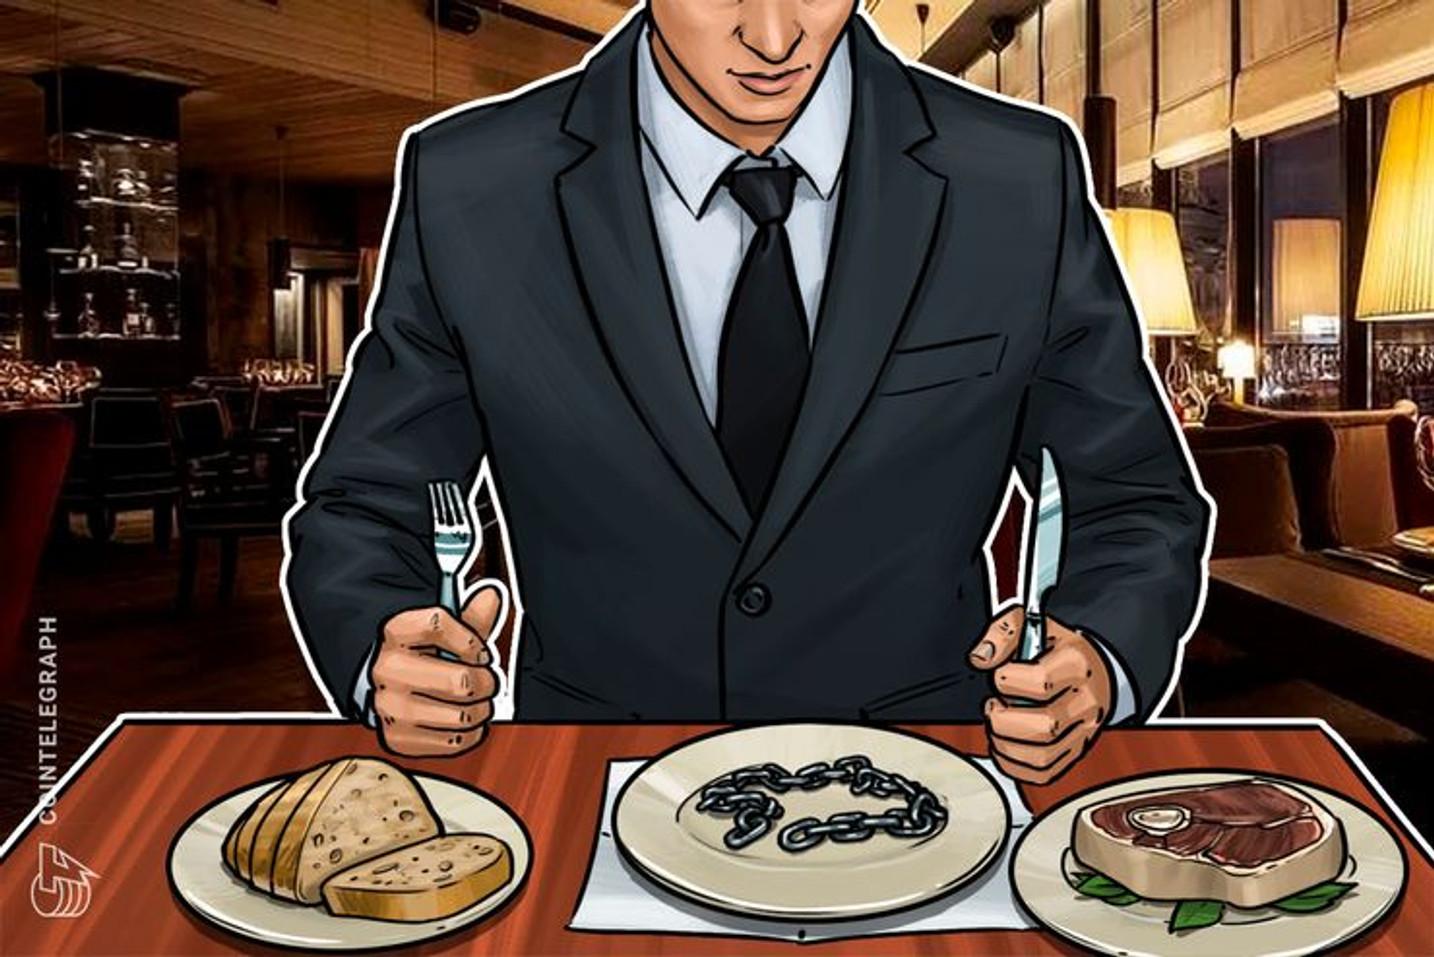 Picanha na blockchain: CPQD firma parceria para rastrear carnes no Brasil usando tecnologia do Bitcoin